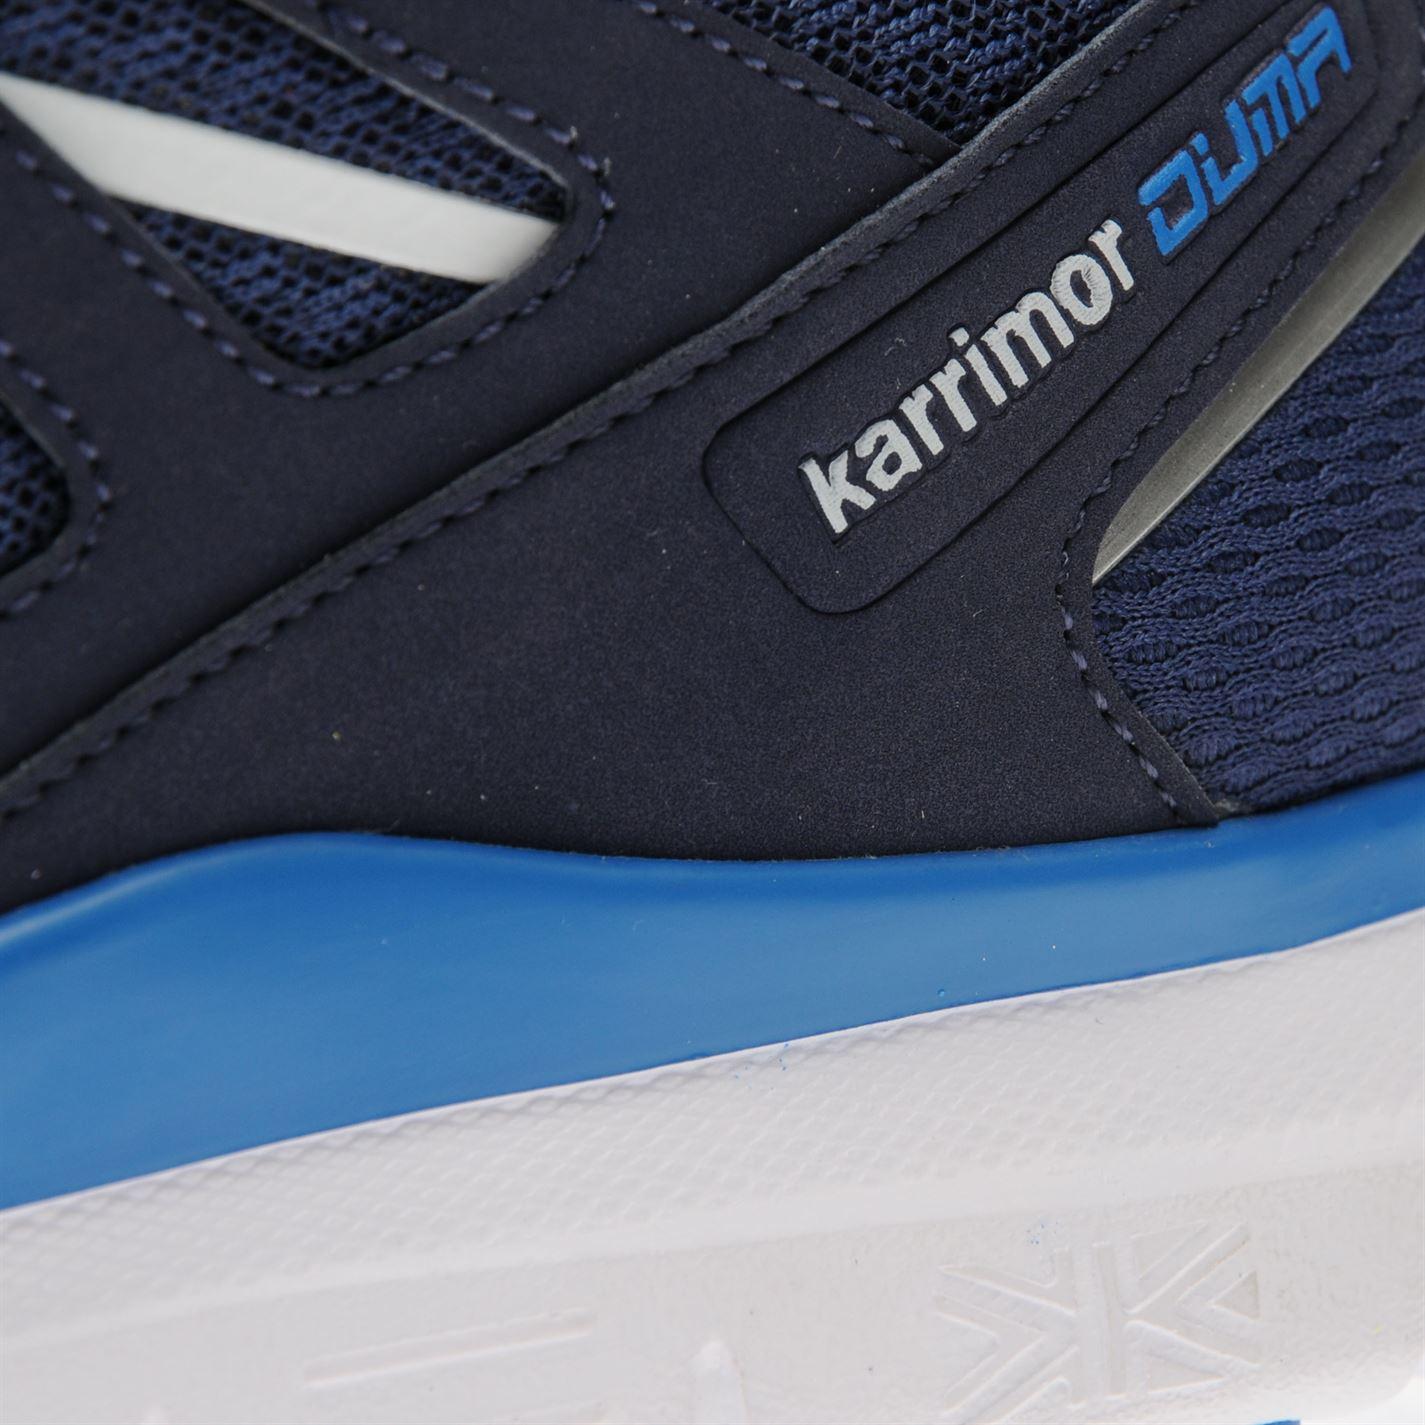 Karrimor-Mens-Duma-Trainers-Lace-Up-Sports-Running-Cross-Training-Shoes thumbnail 26